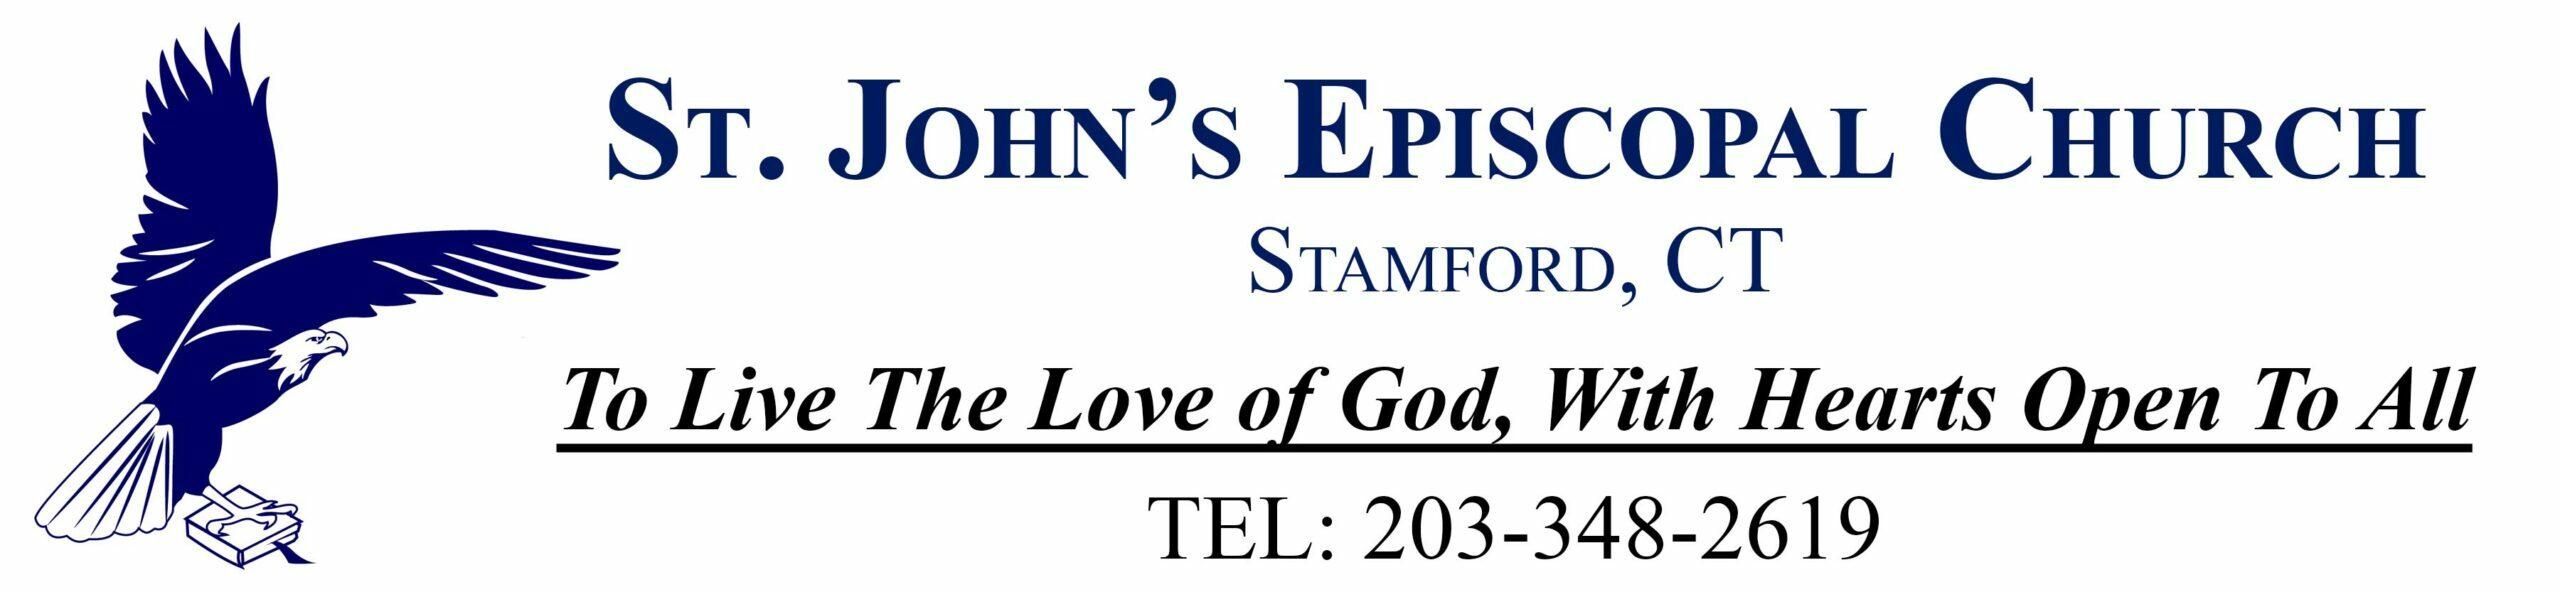 St. John's Episcopal Church – Stamford CT